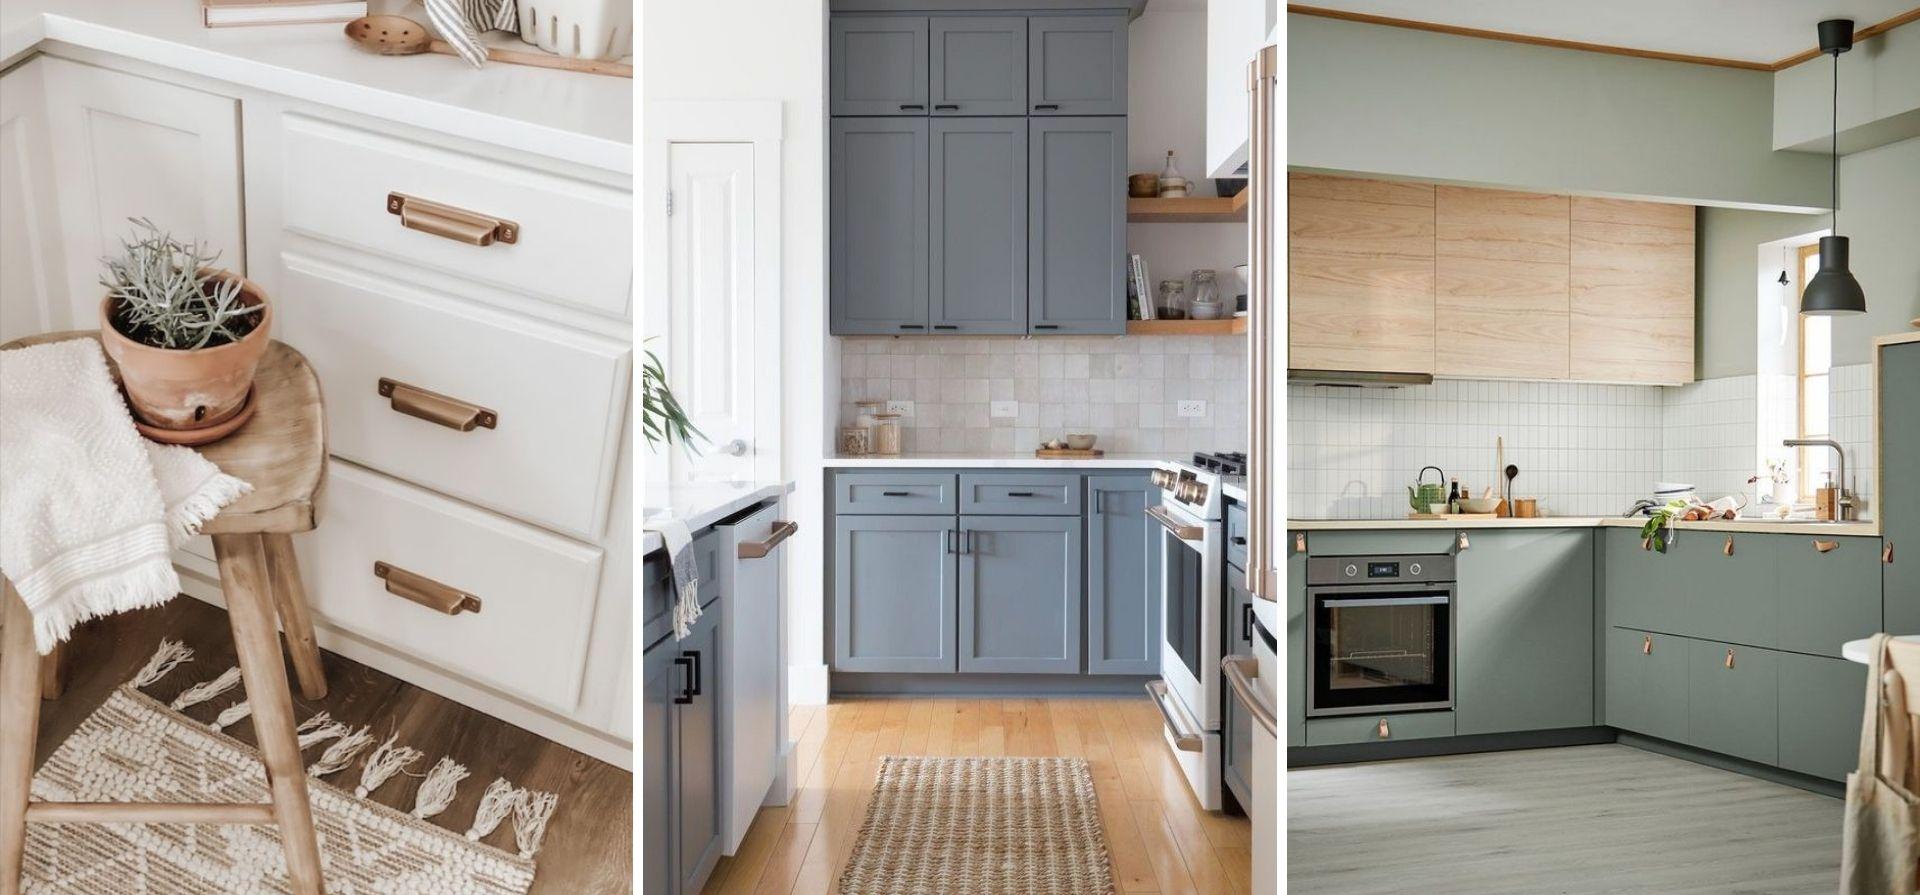 changer poignee armoire cuisine